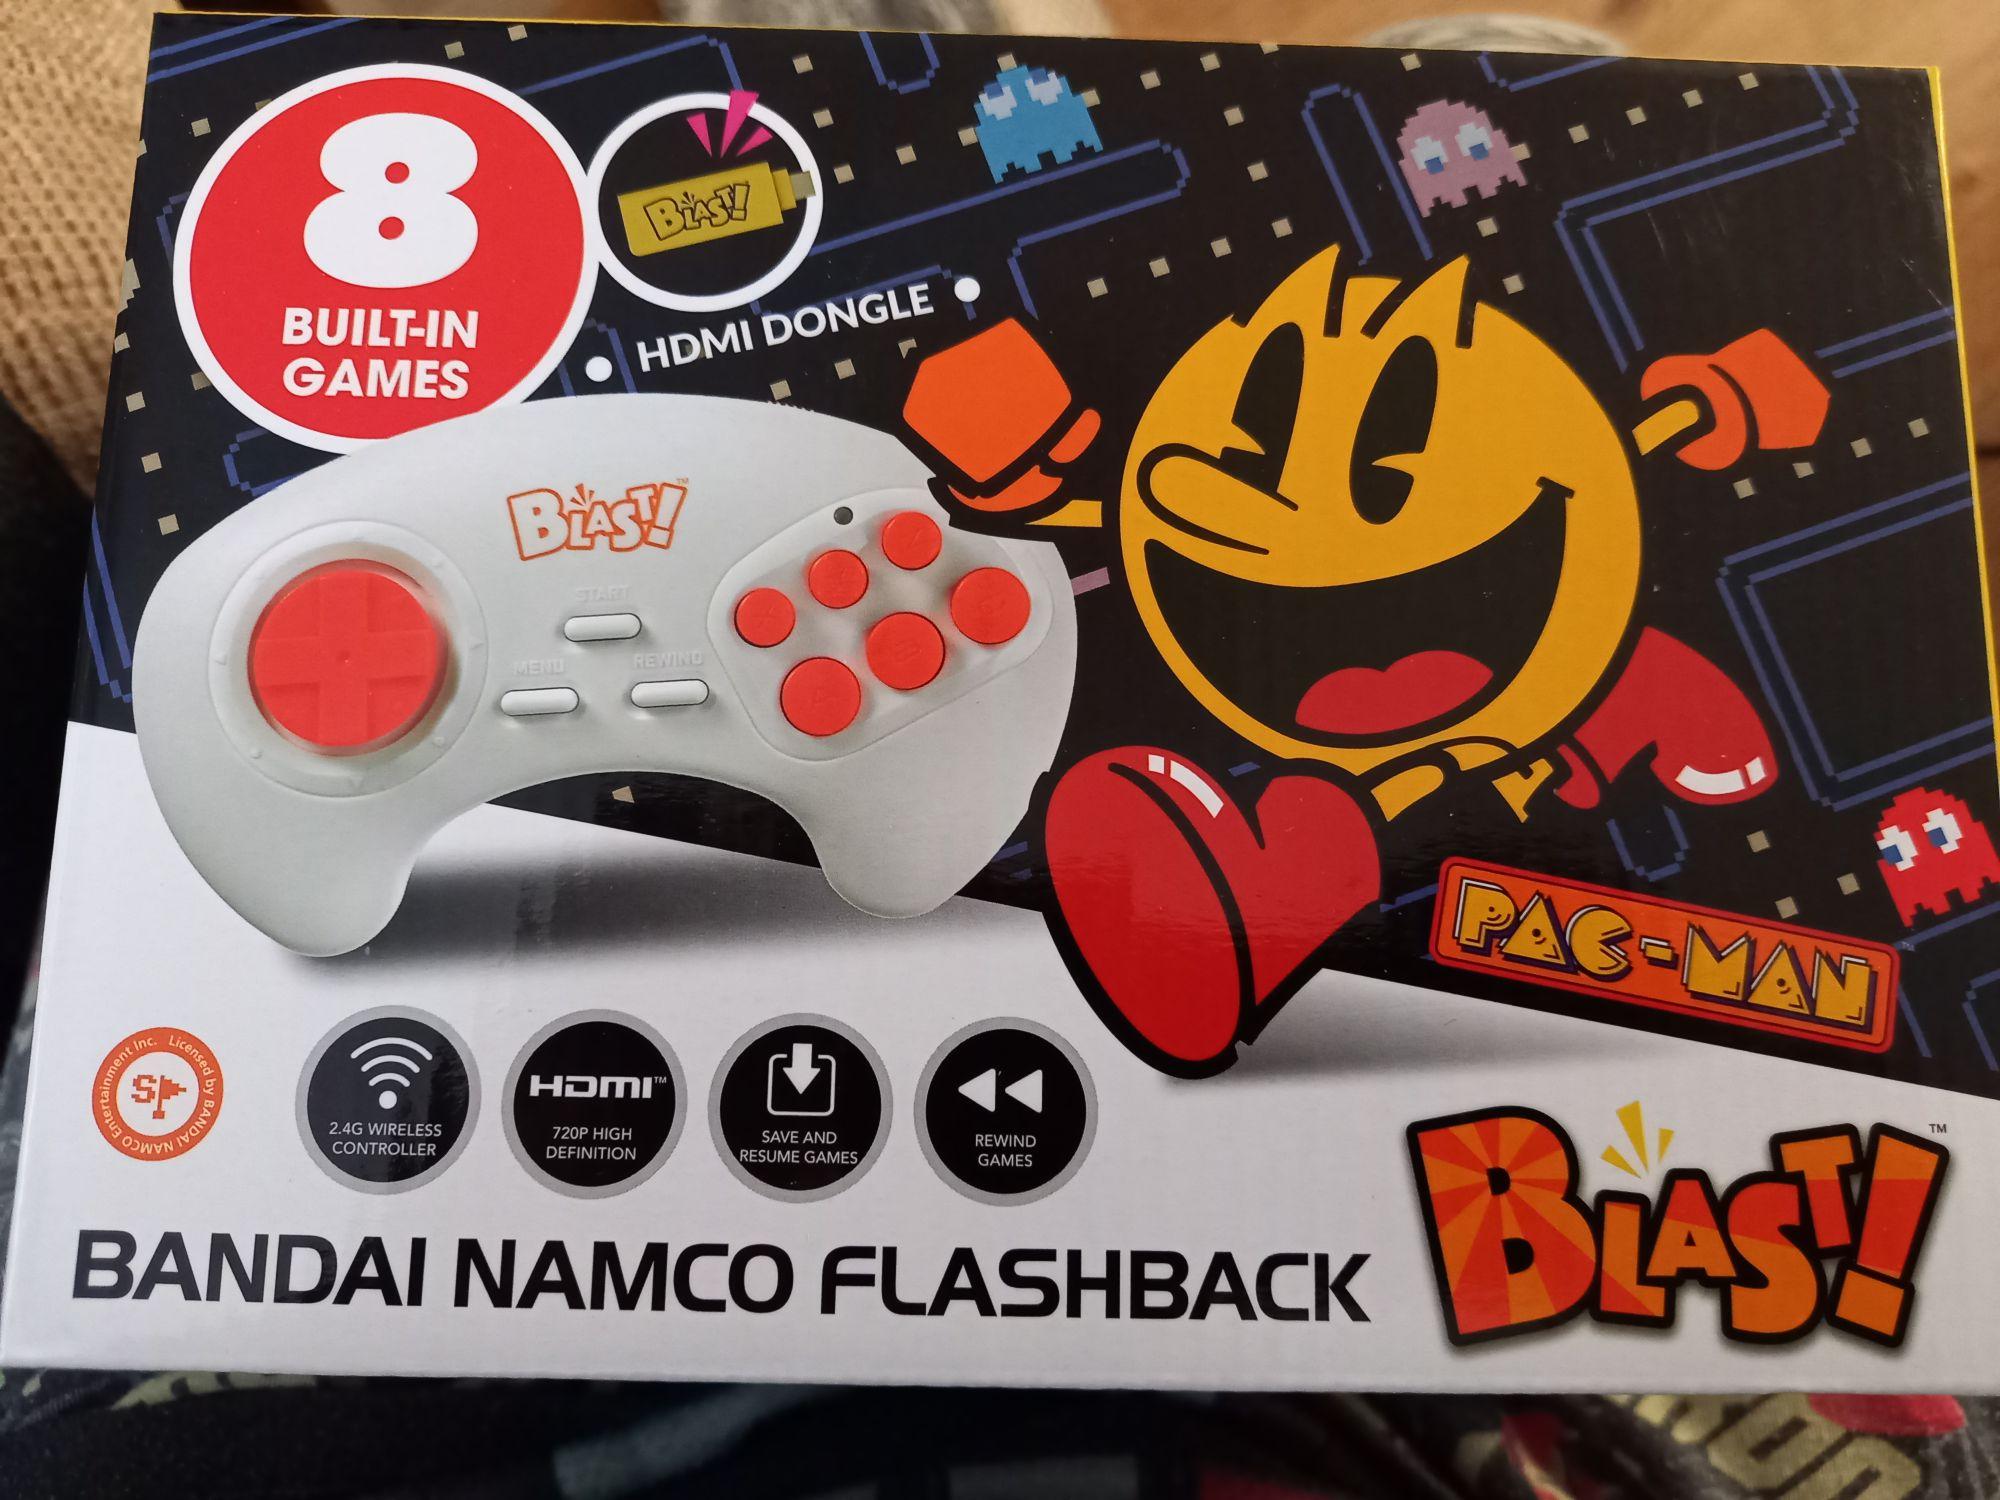 Bandai Namco flashback blast! By atgames - £6.99 in store at Yorkshire Trading (Northallerton)